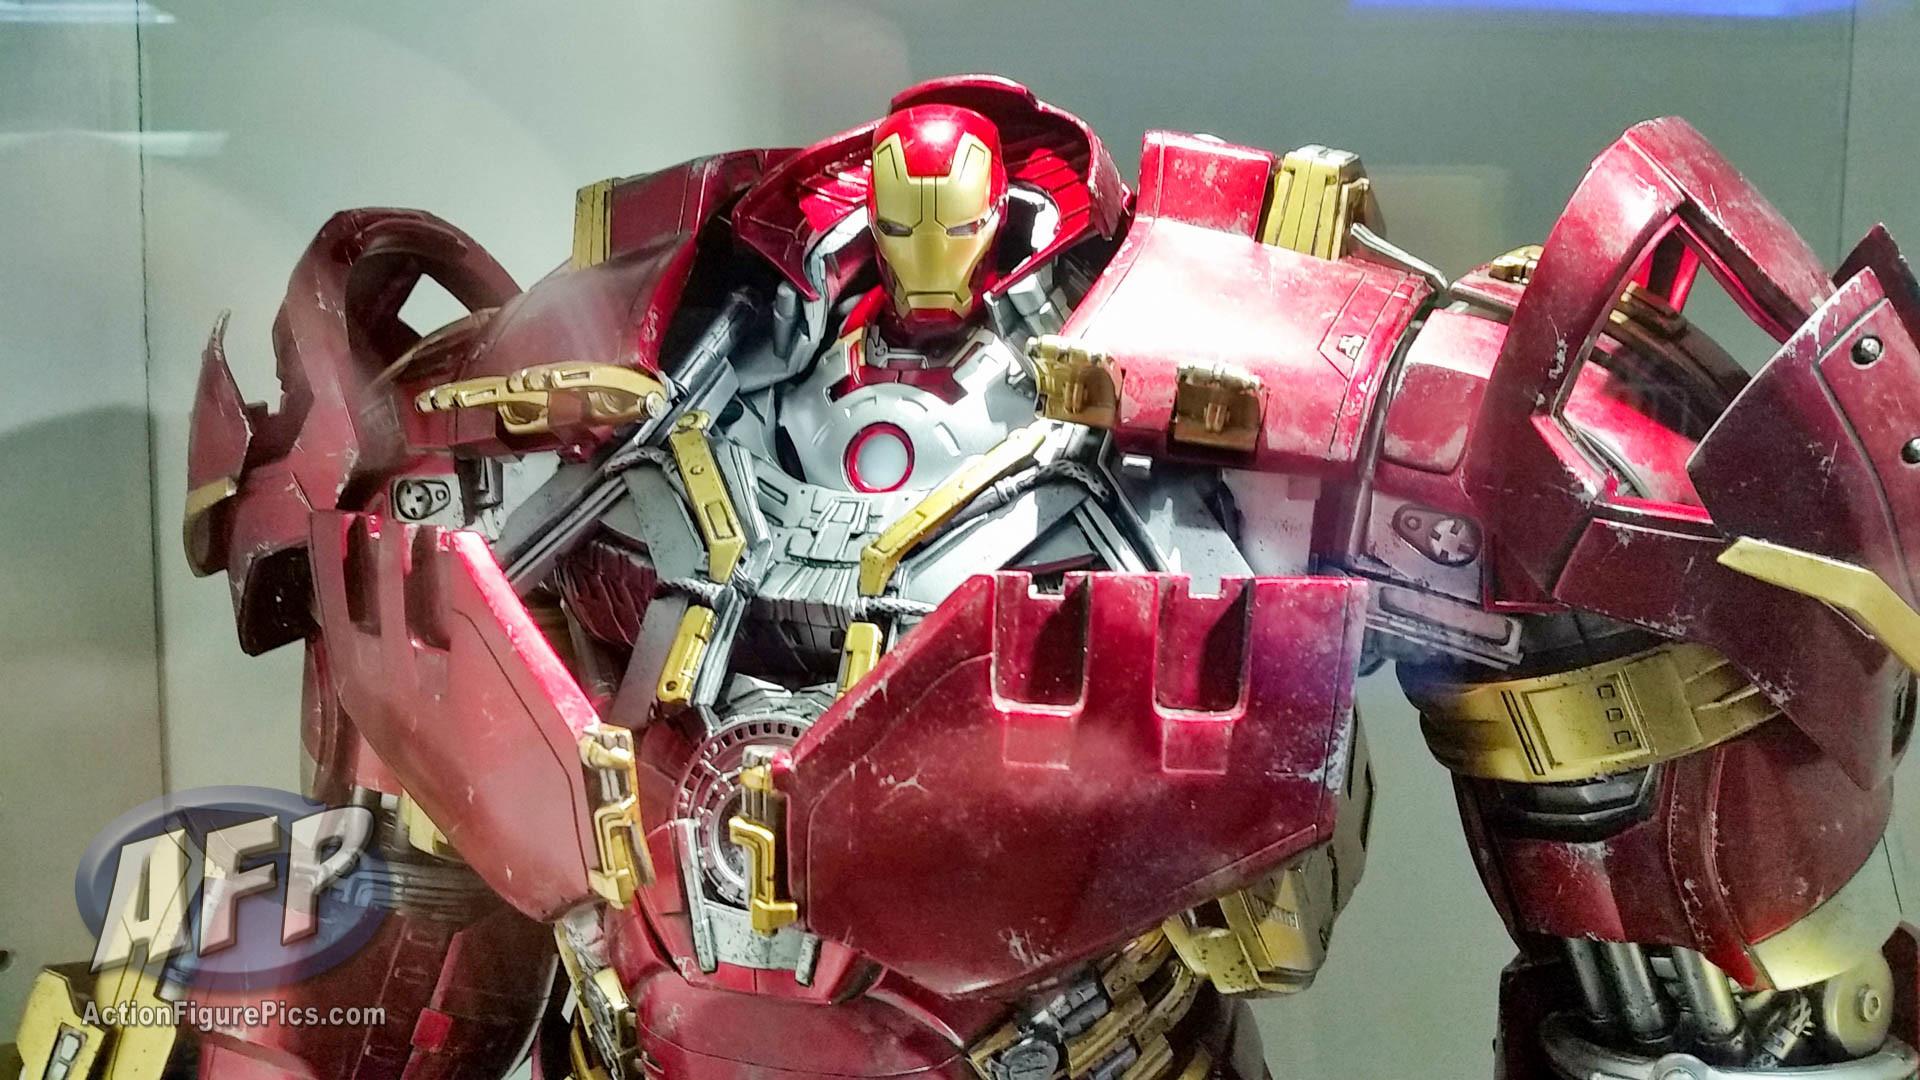 Hot Toys Secret Base (Hong Kong) Avengers Age of Ultron Hulkbuster Iron Man  and Hulk (4 of 6)